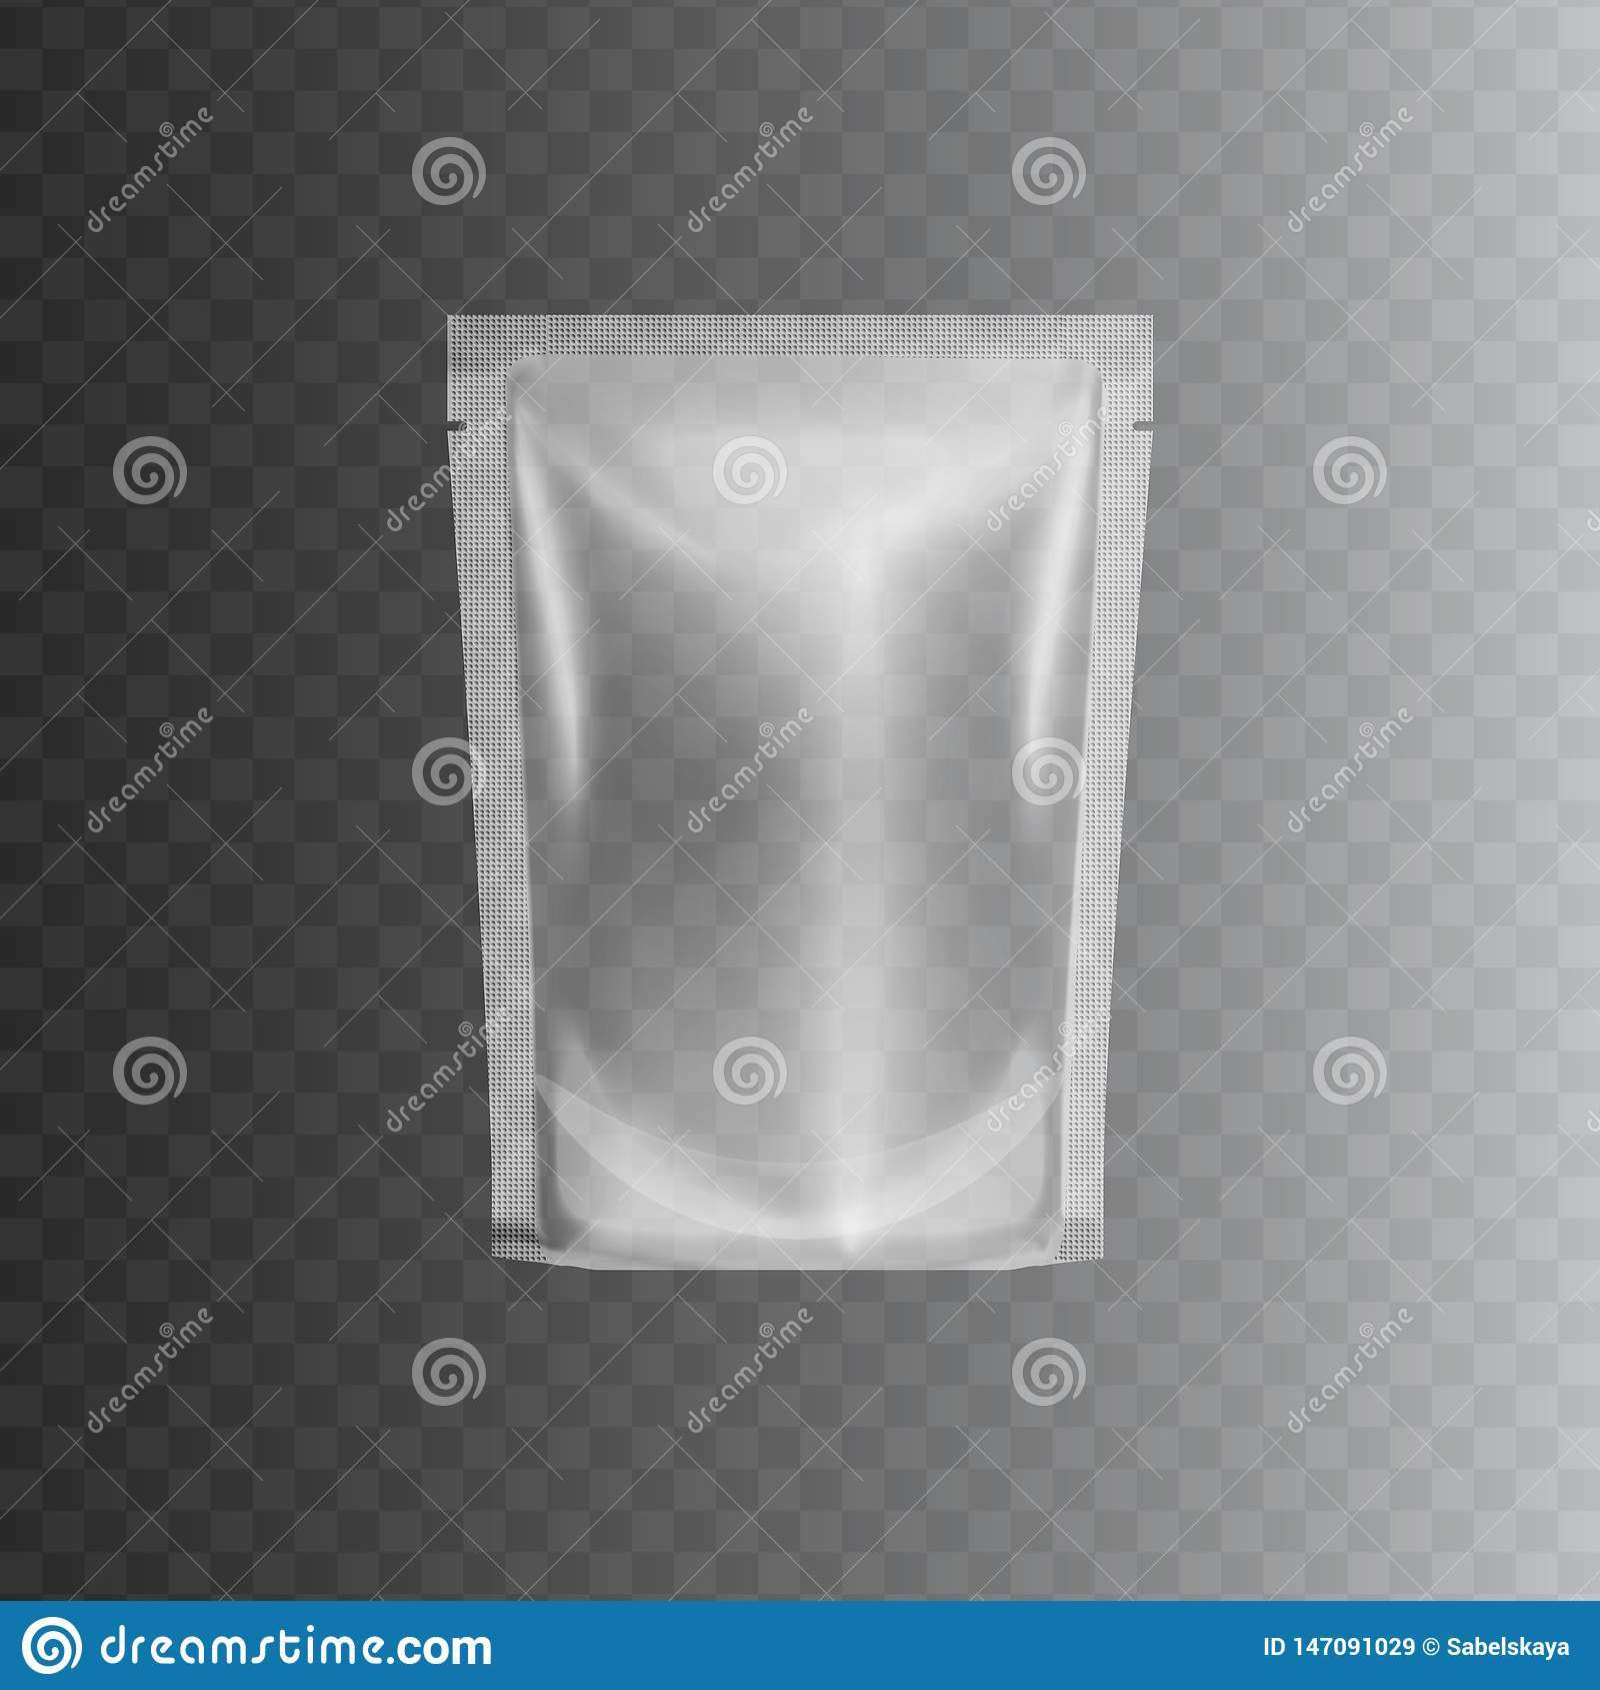 Ontruim verzegeld plastic zakpakket, realistisch 3d model